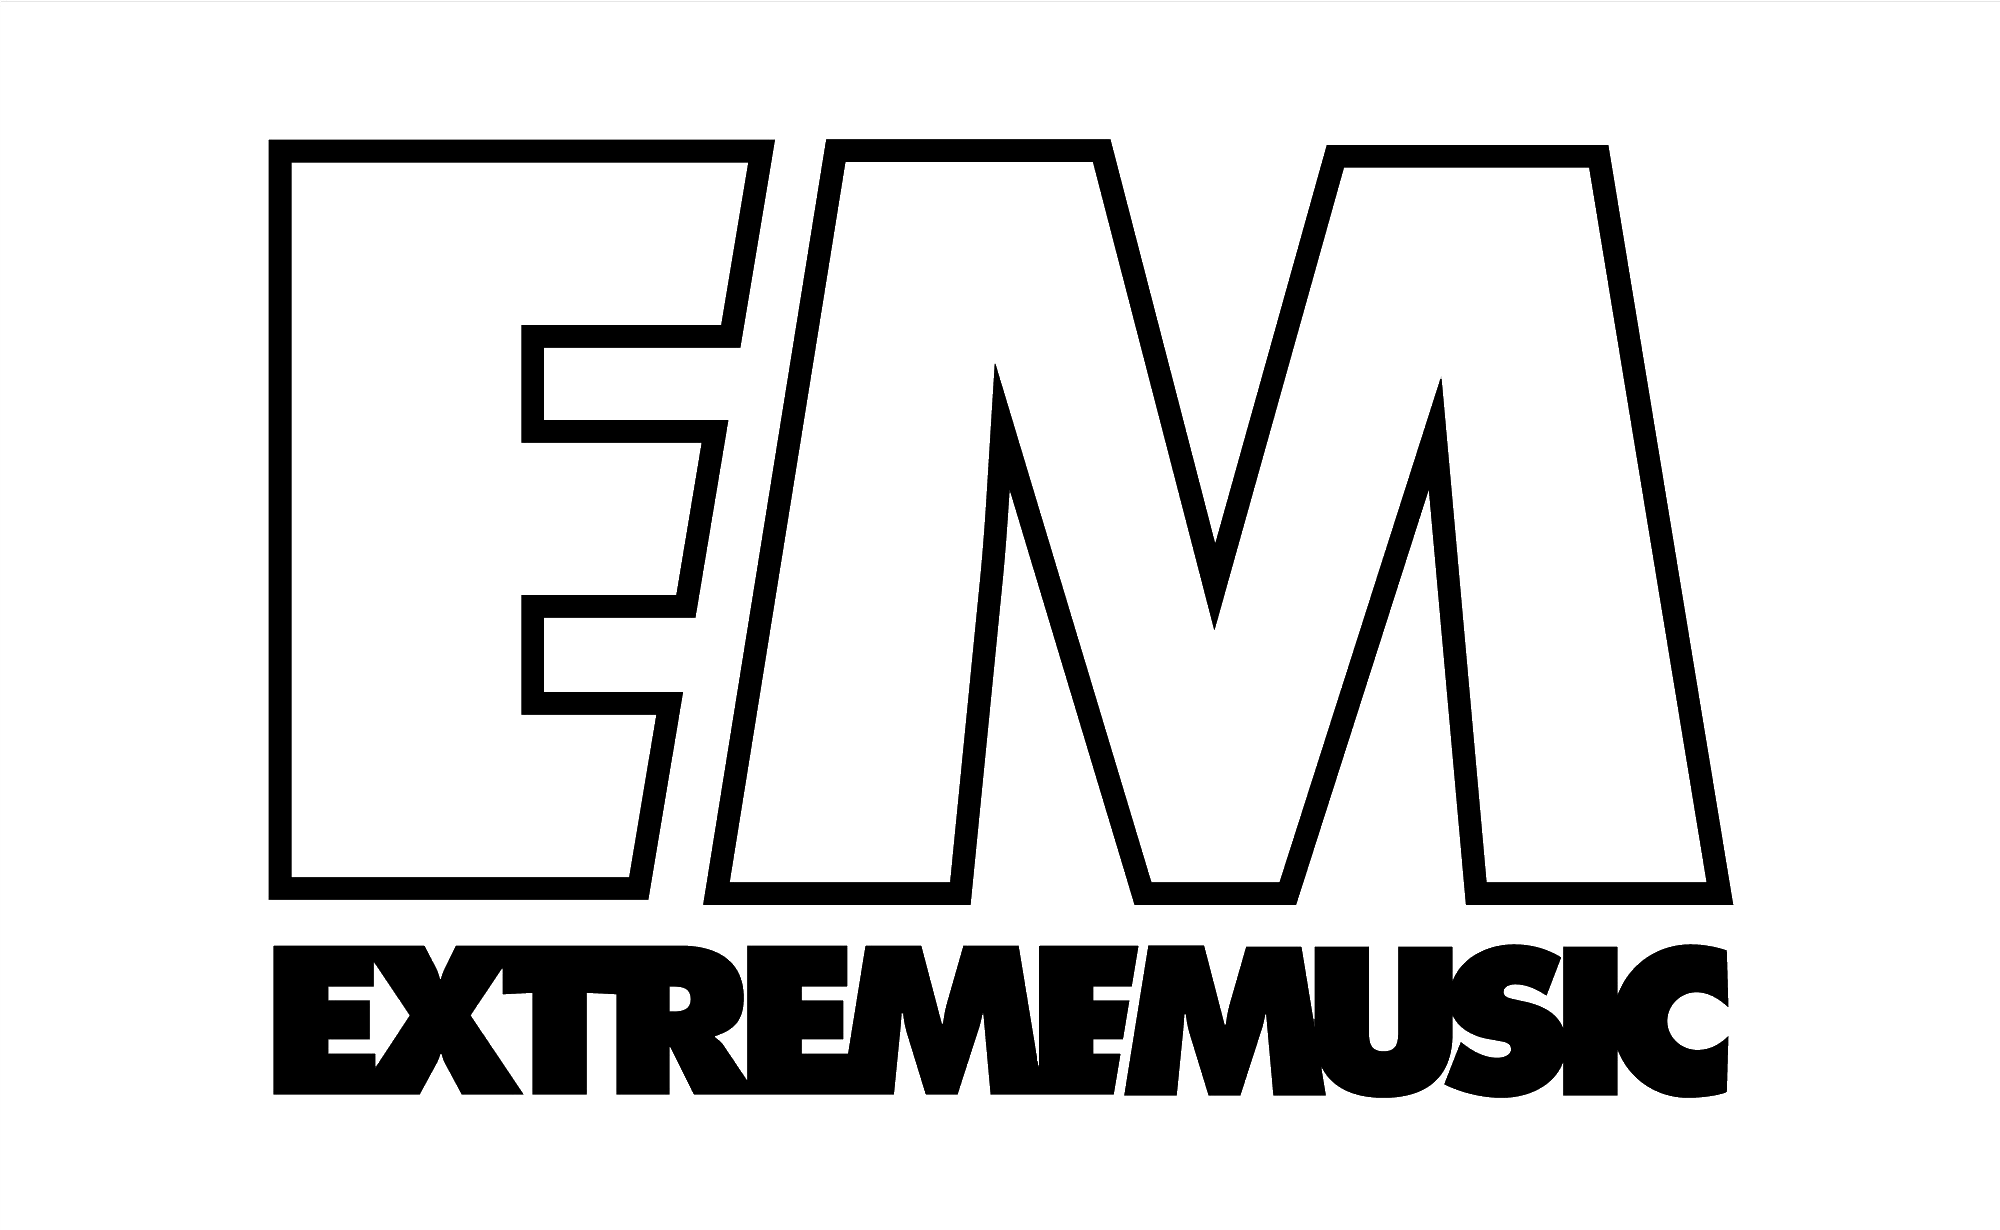 EM_Transparent_BLK (1).png